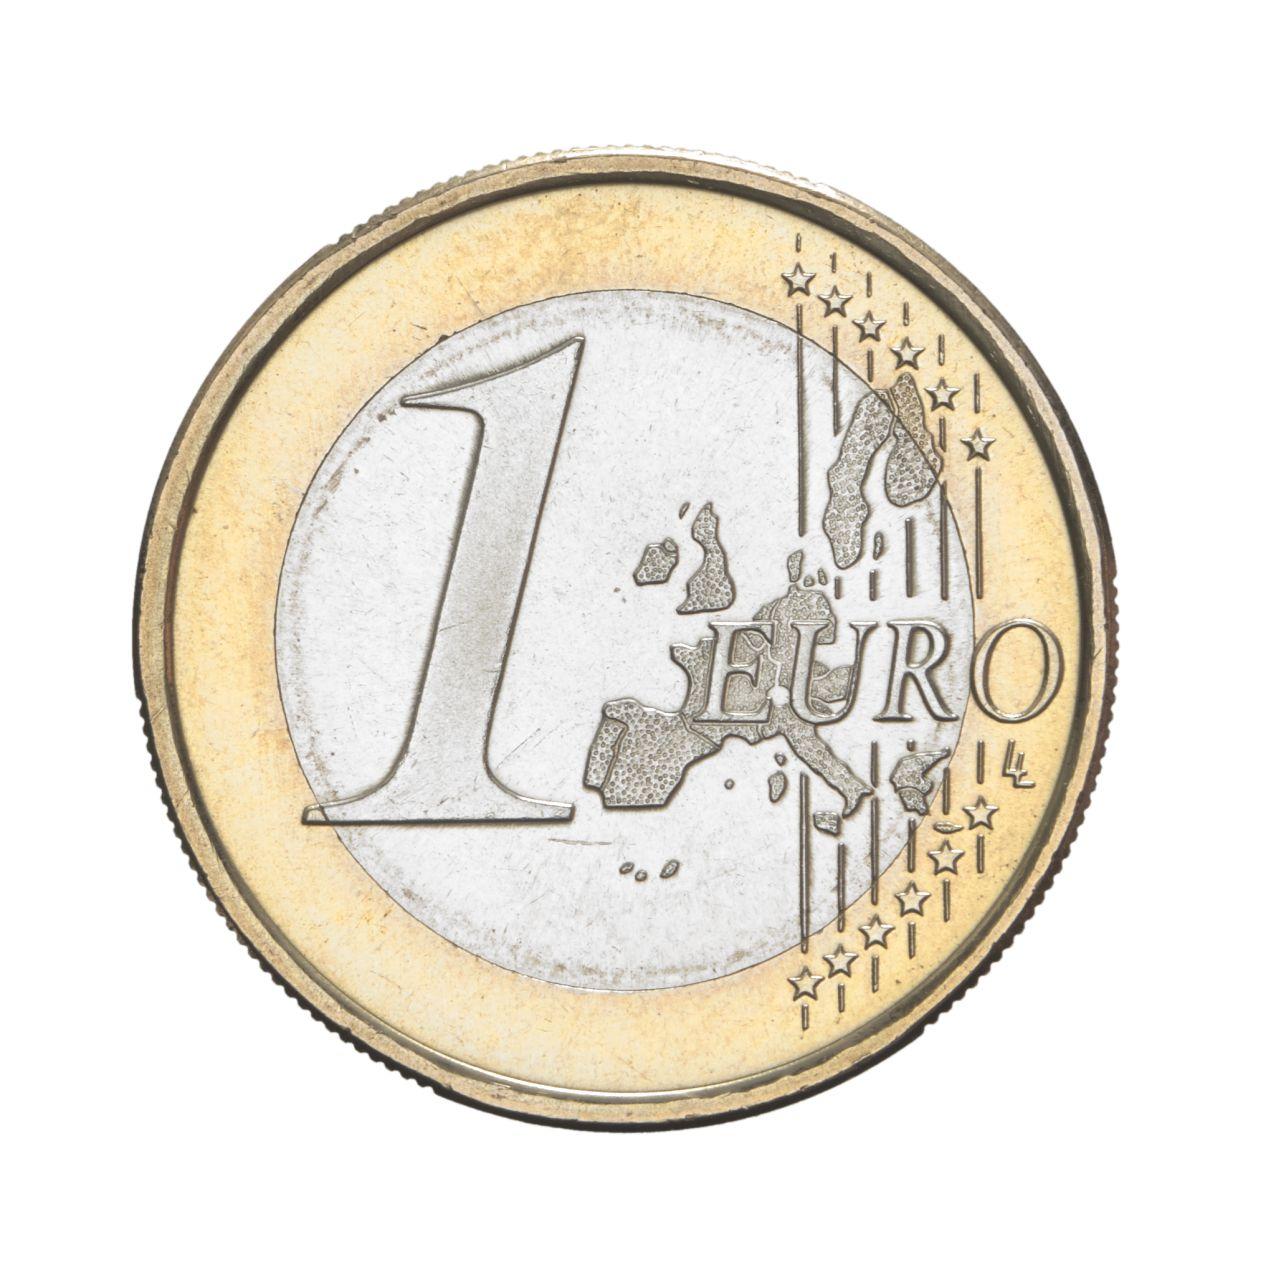 Lemo Objekt Deutsche 1 Euro Münze